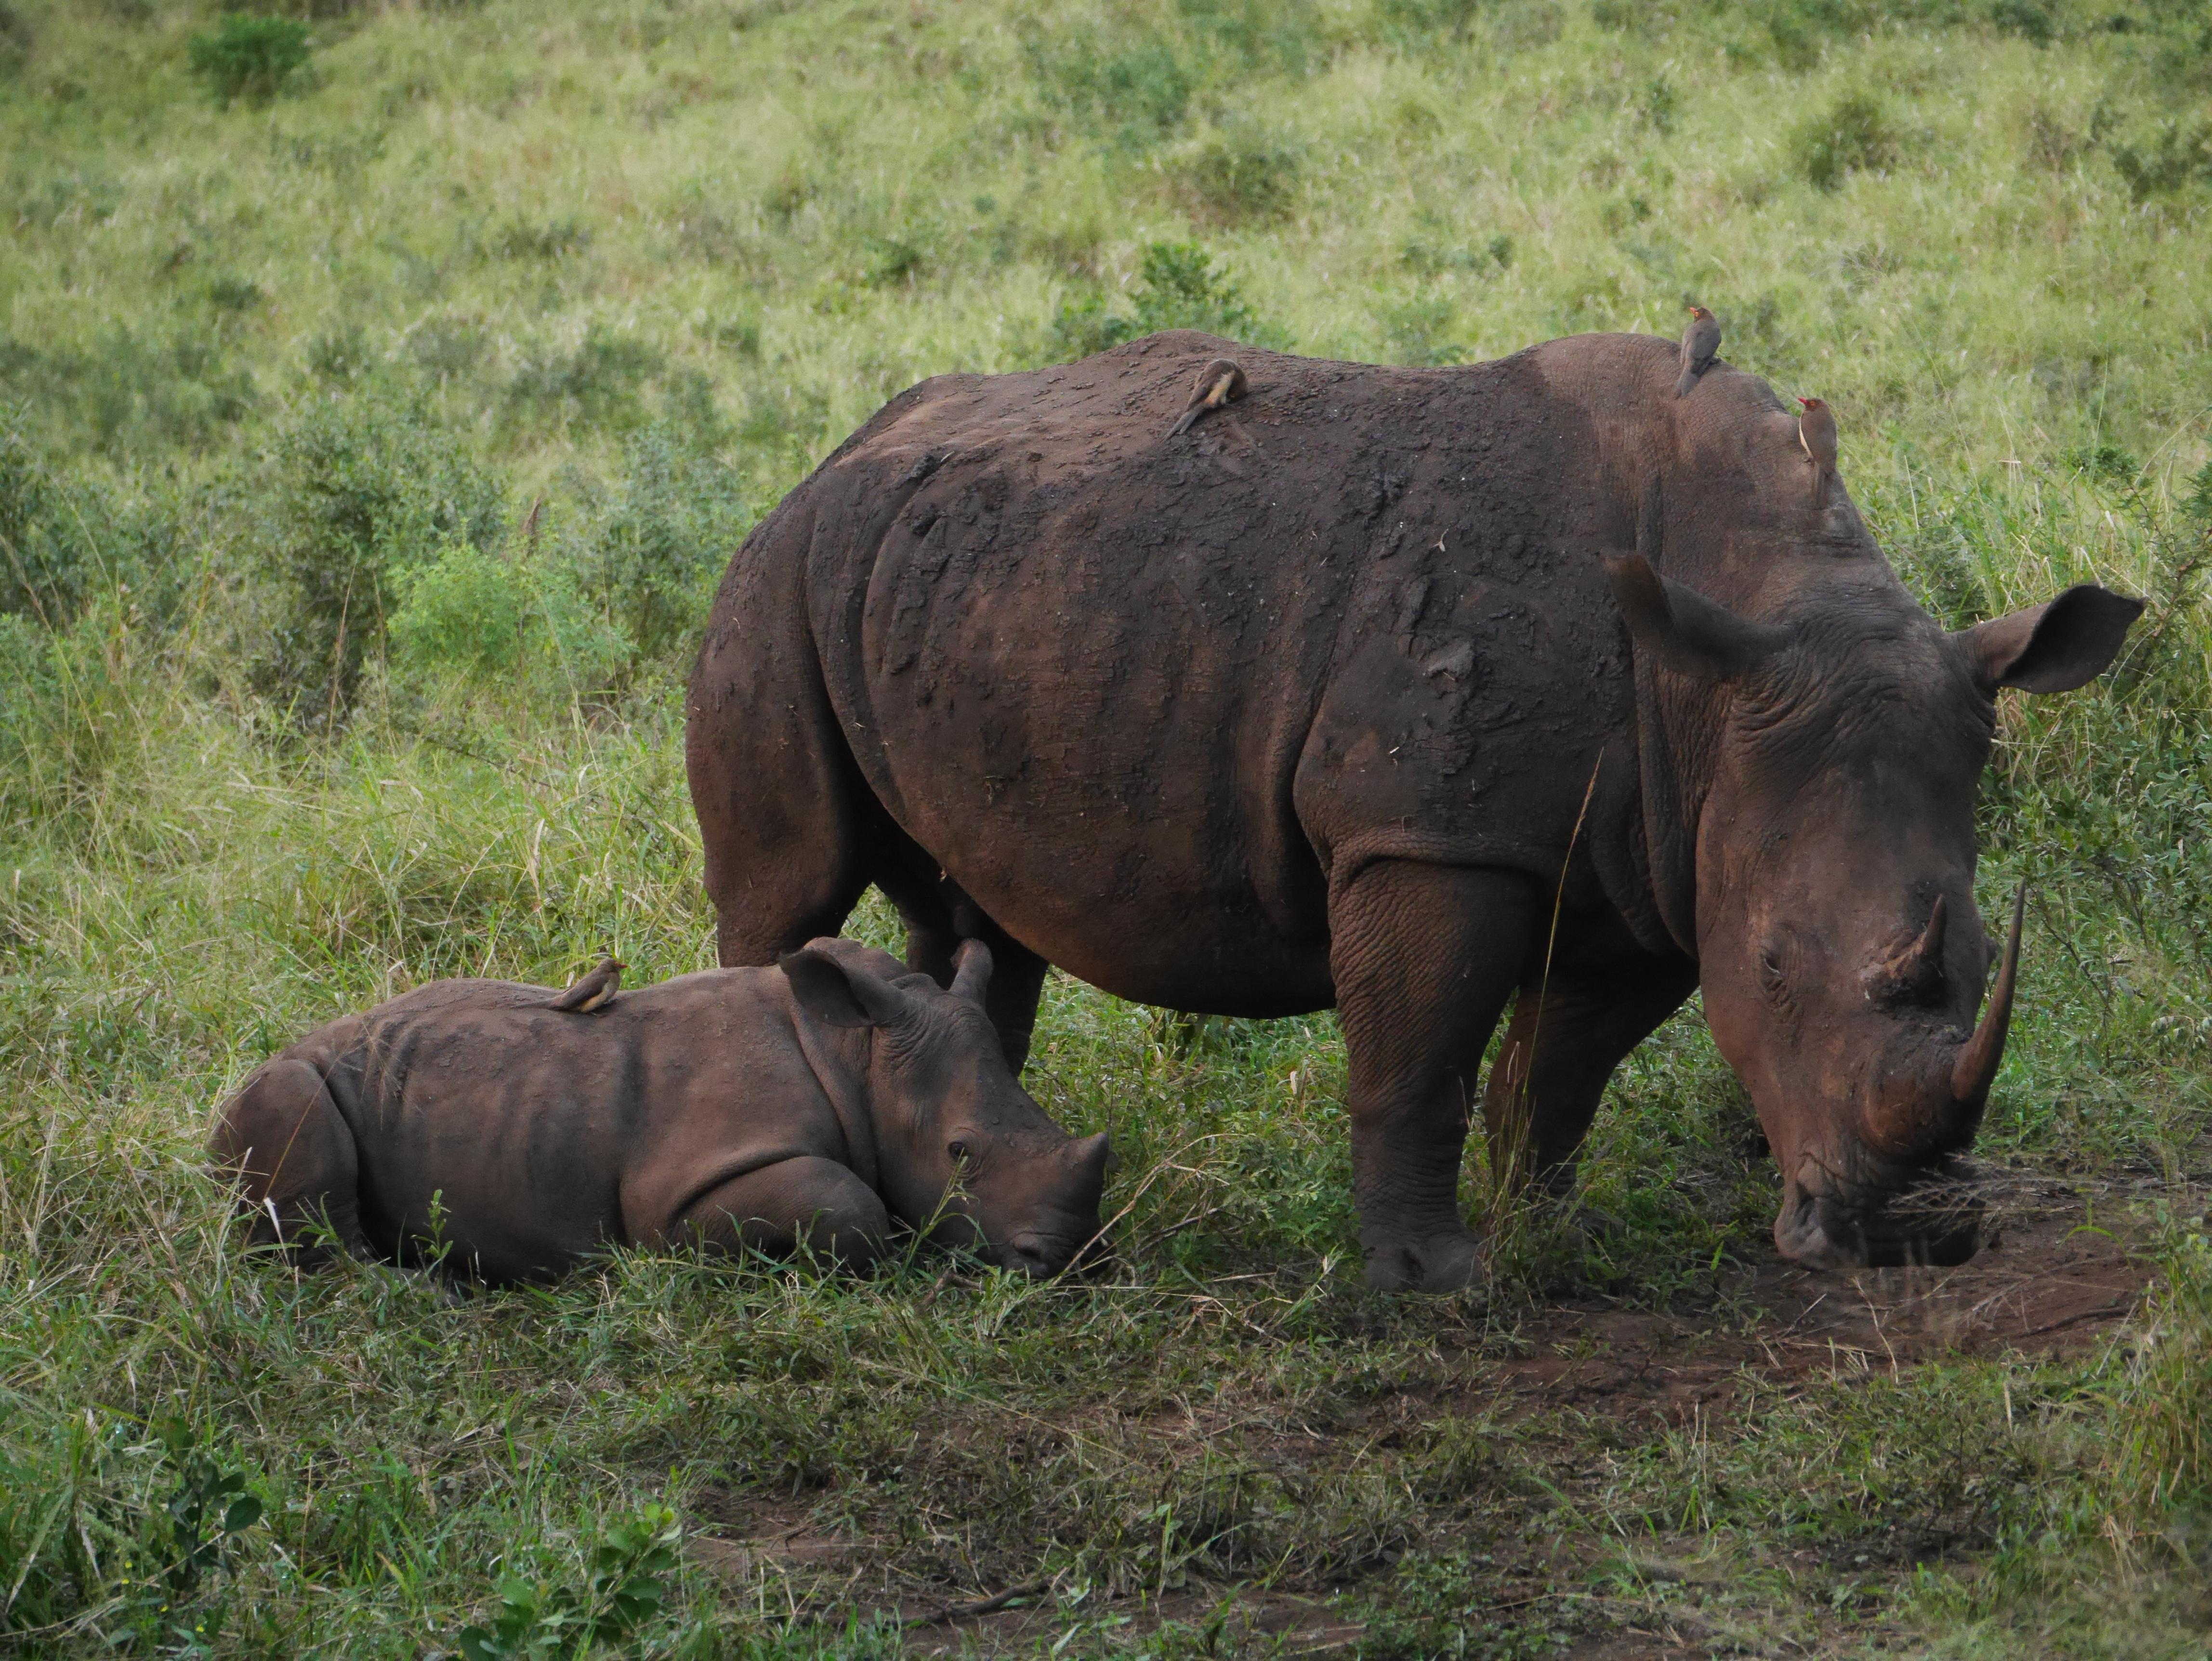 South Africa baby rhino